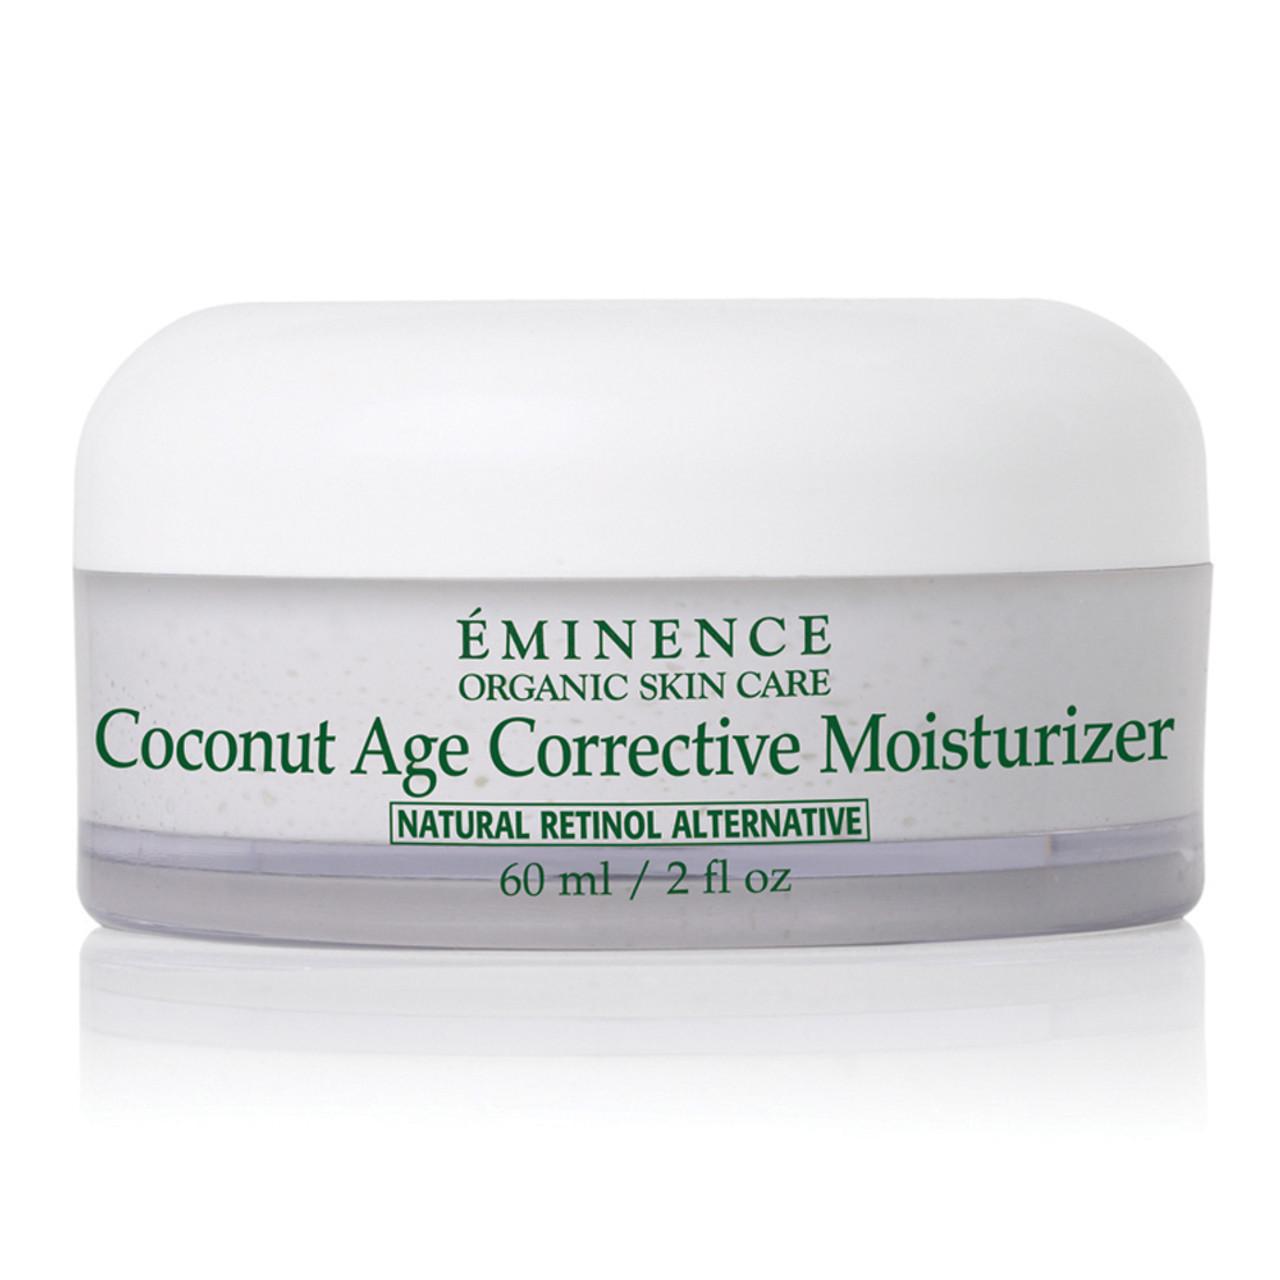 Eminence Coconut Age Corrective Moisturizer BeautifiedYou.com